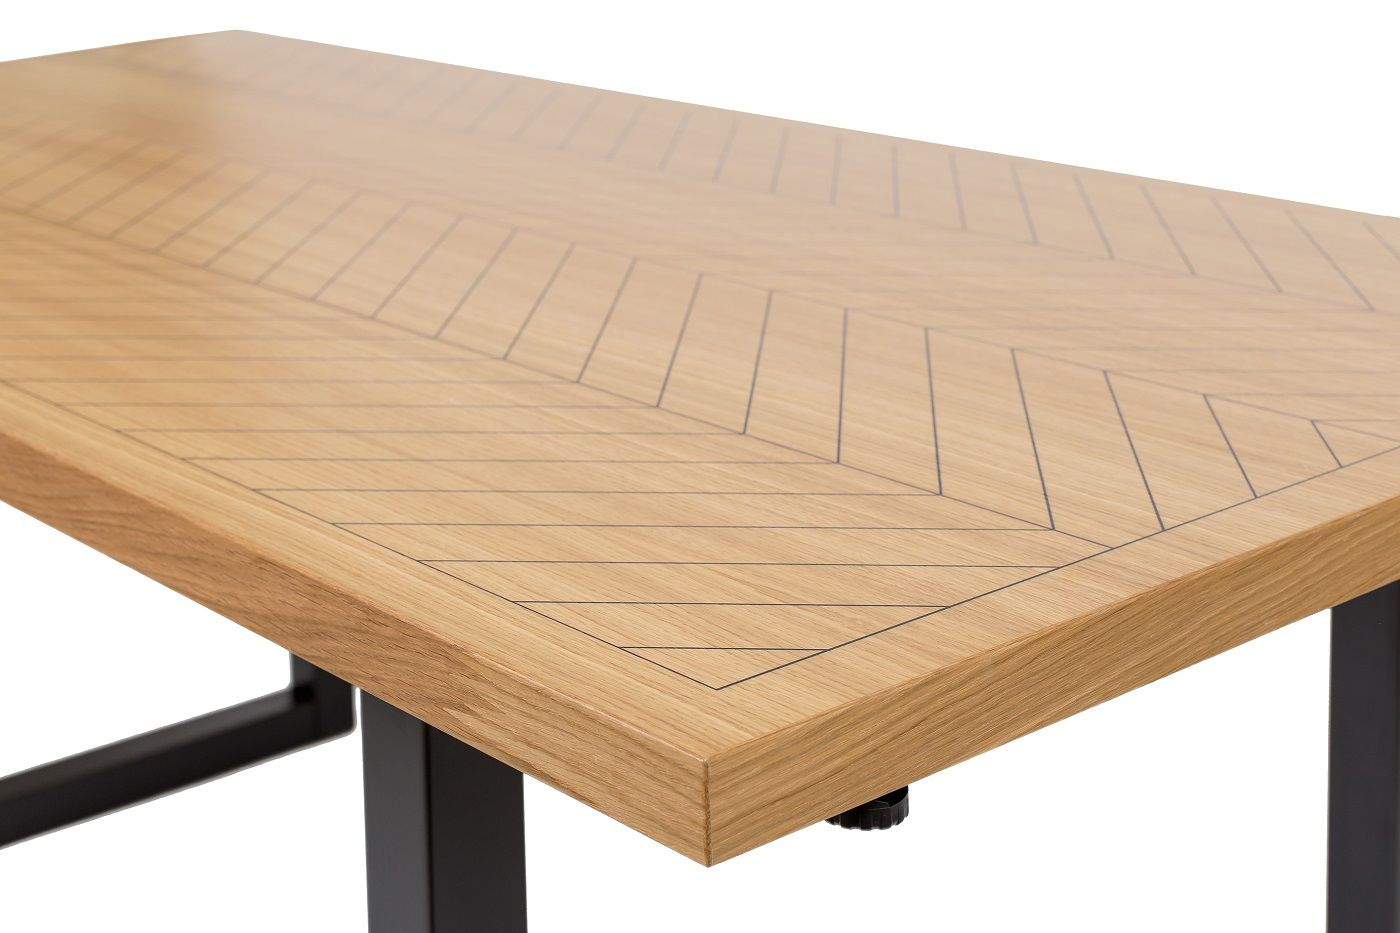 Woodman - Camden Spisebord 180x90 - Sildebens print